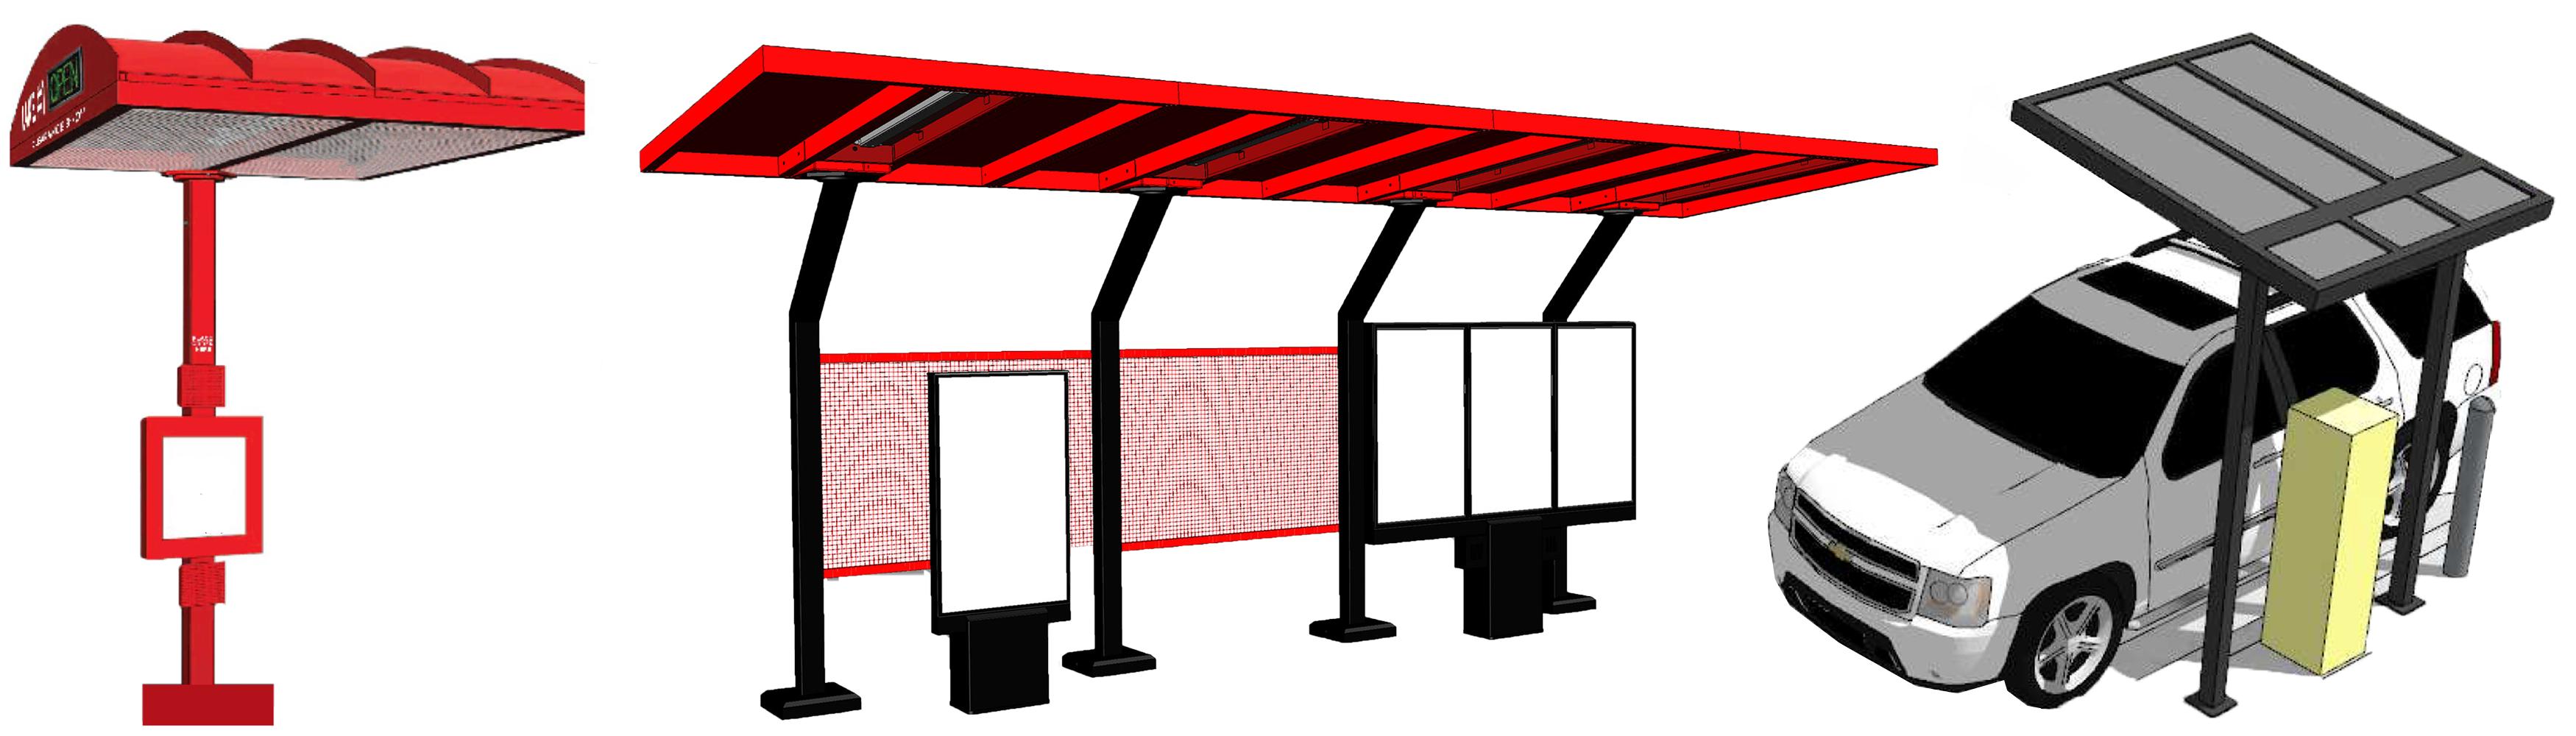 Custom Canopy Designs